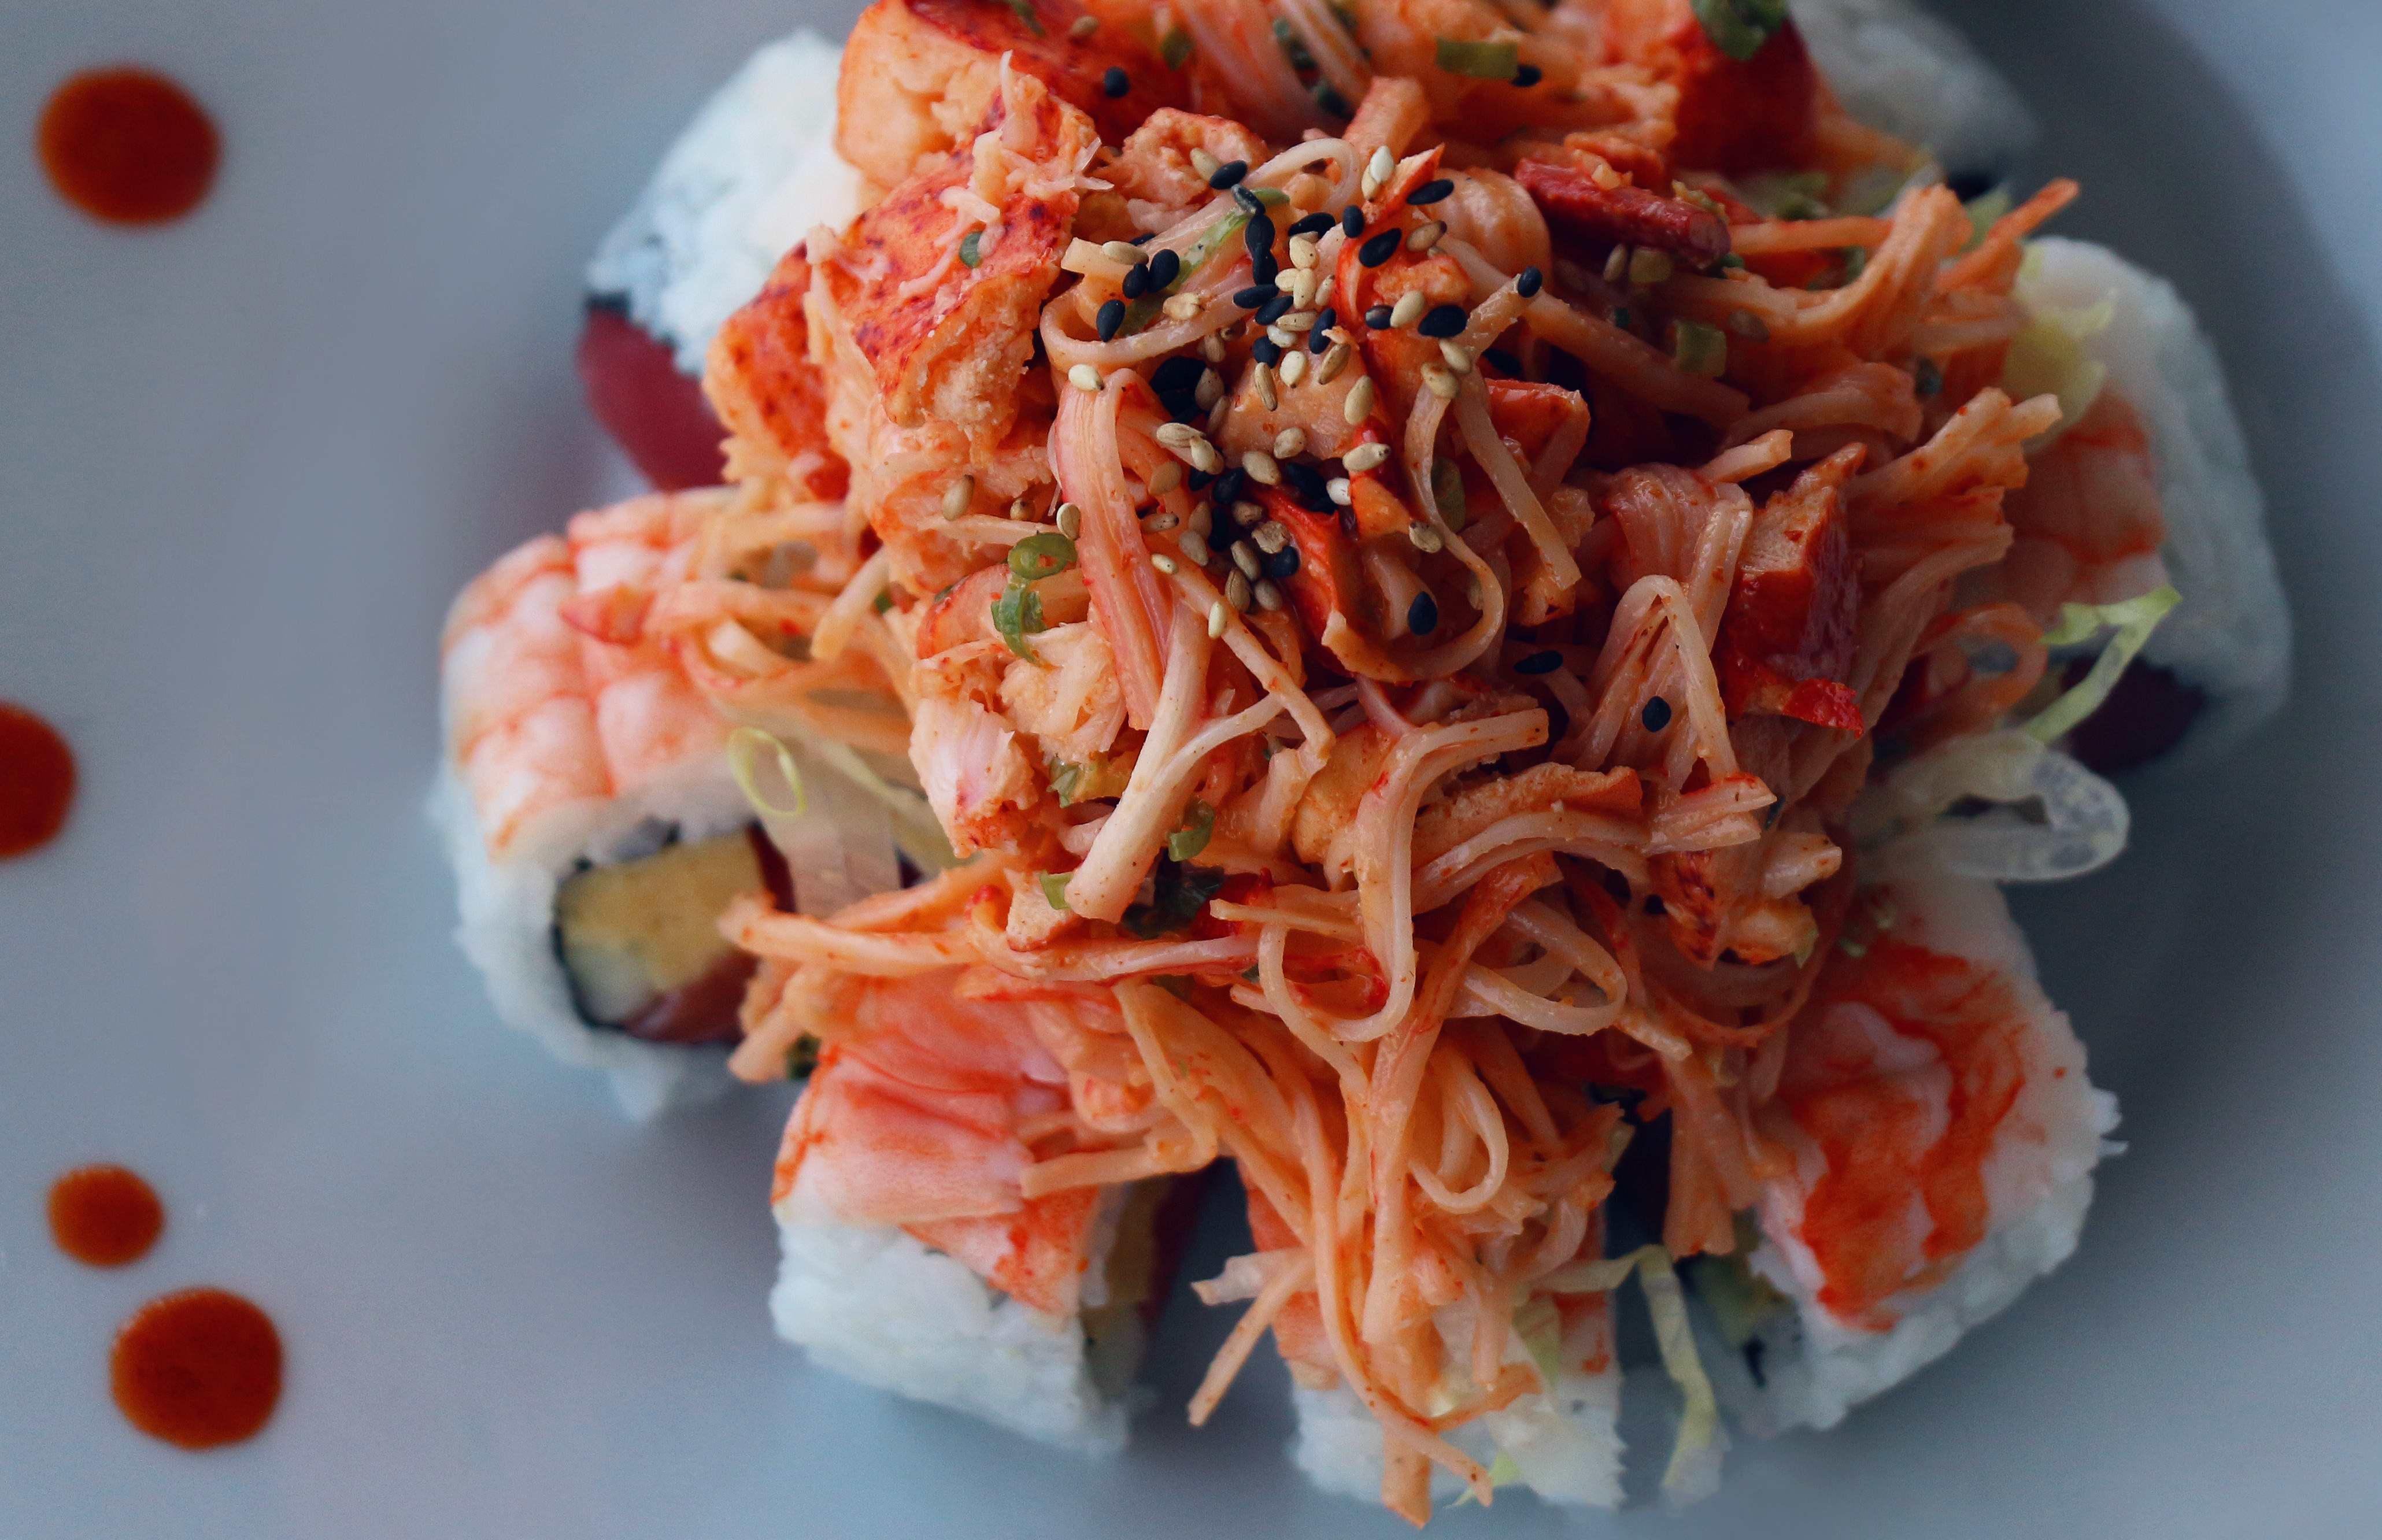 – 8 c dragon roll sushi beach bar at newport pier serene miami photographer katherine eastman recipe food photography photo journalism waves ocean bal harbour_01